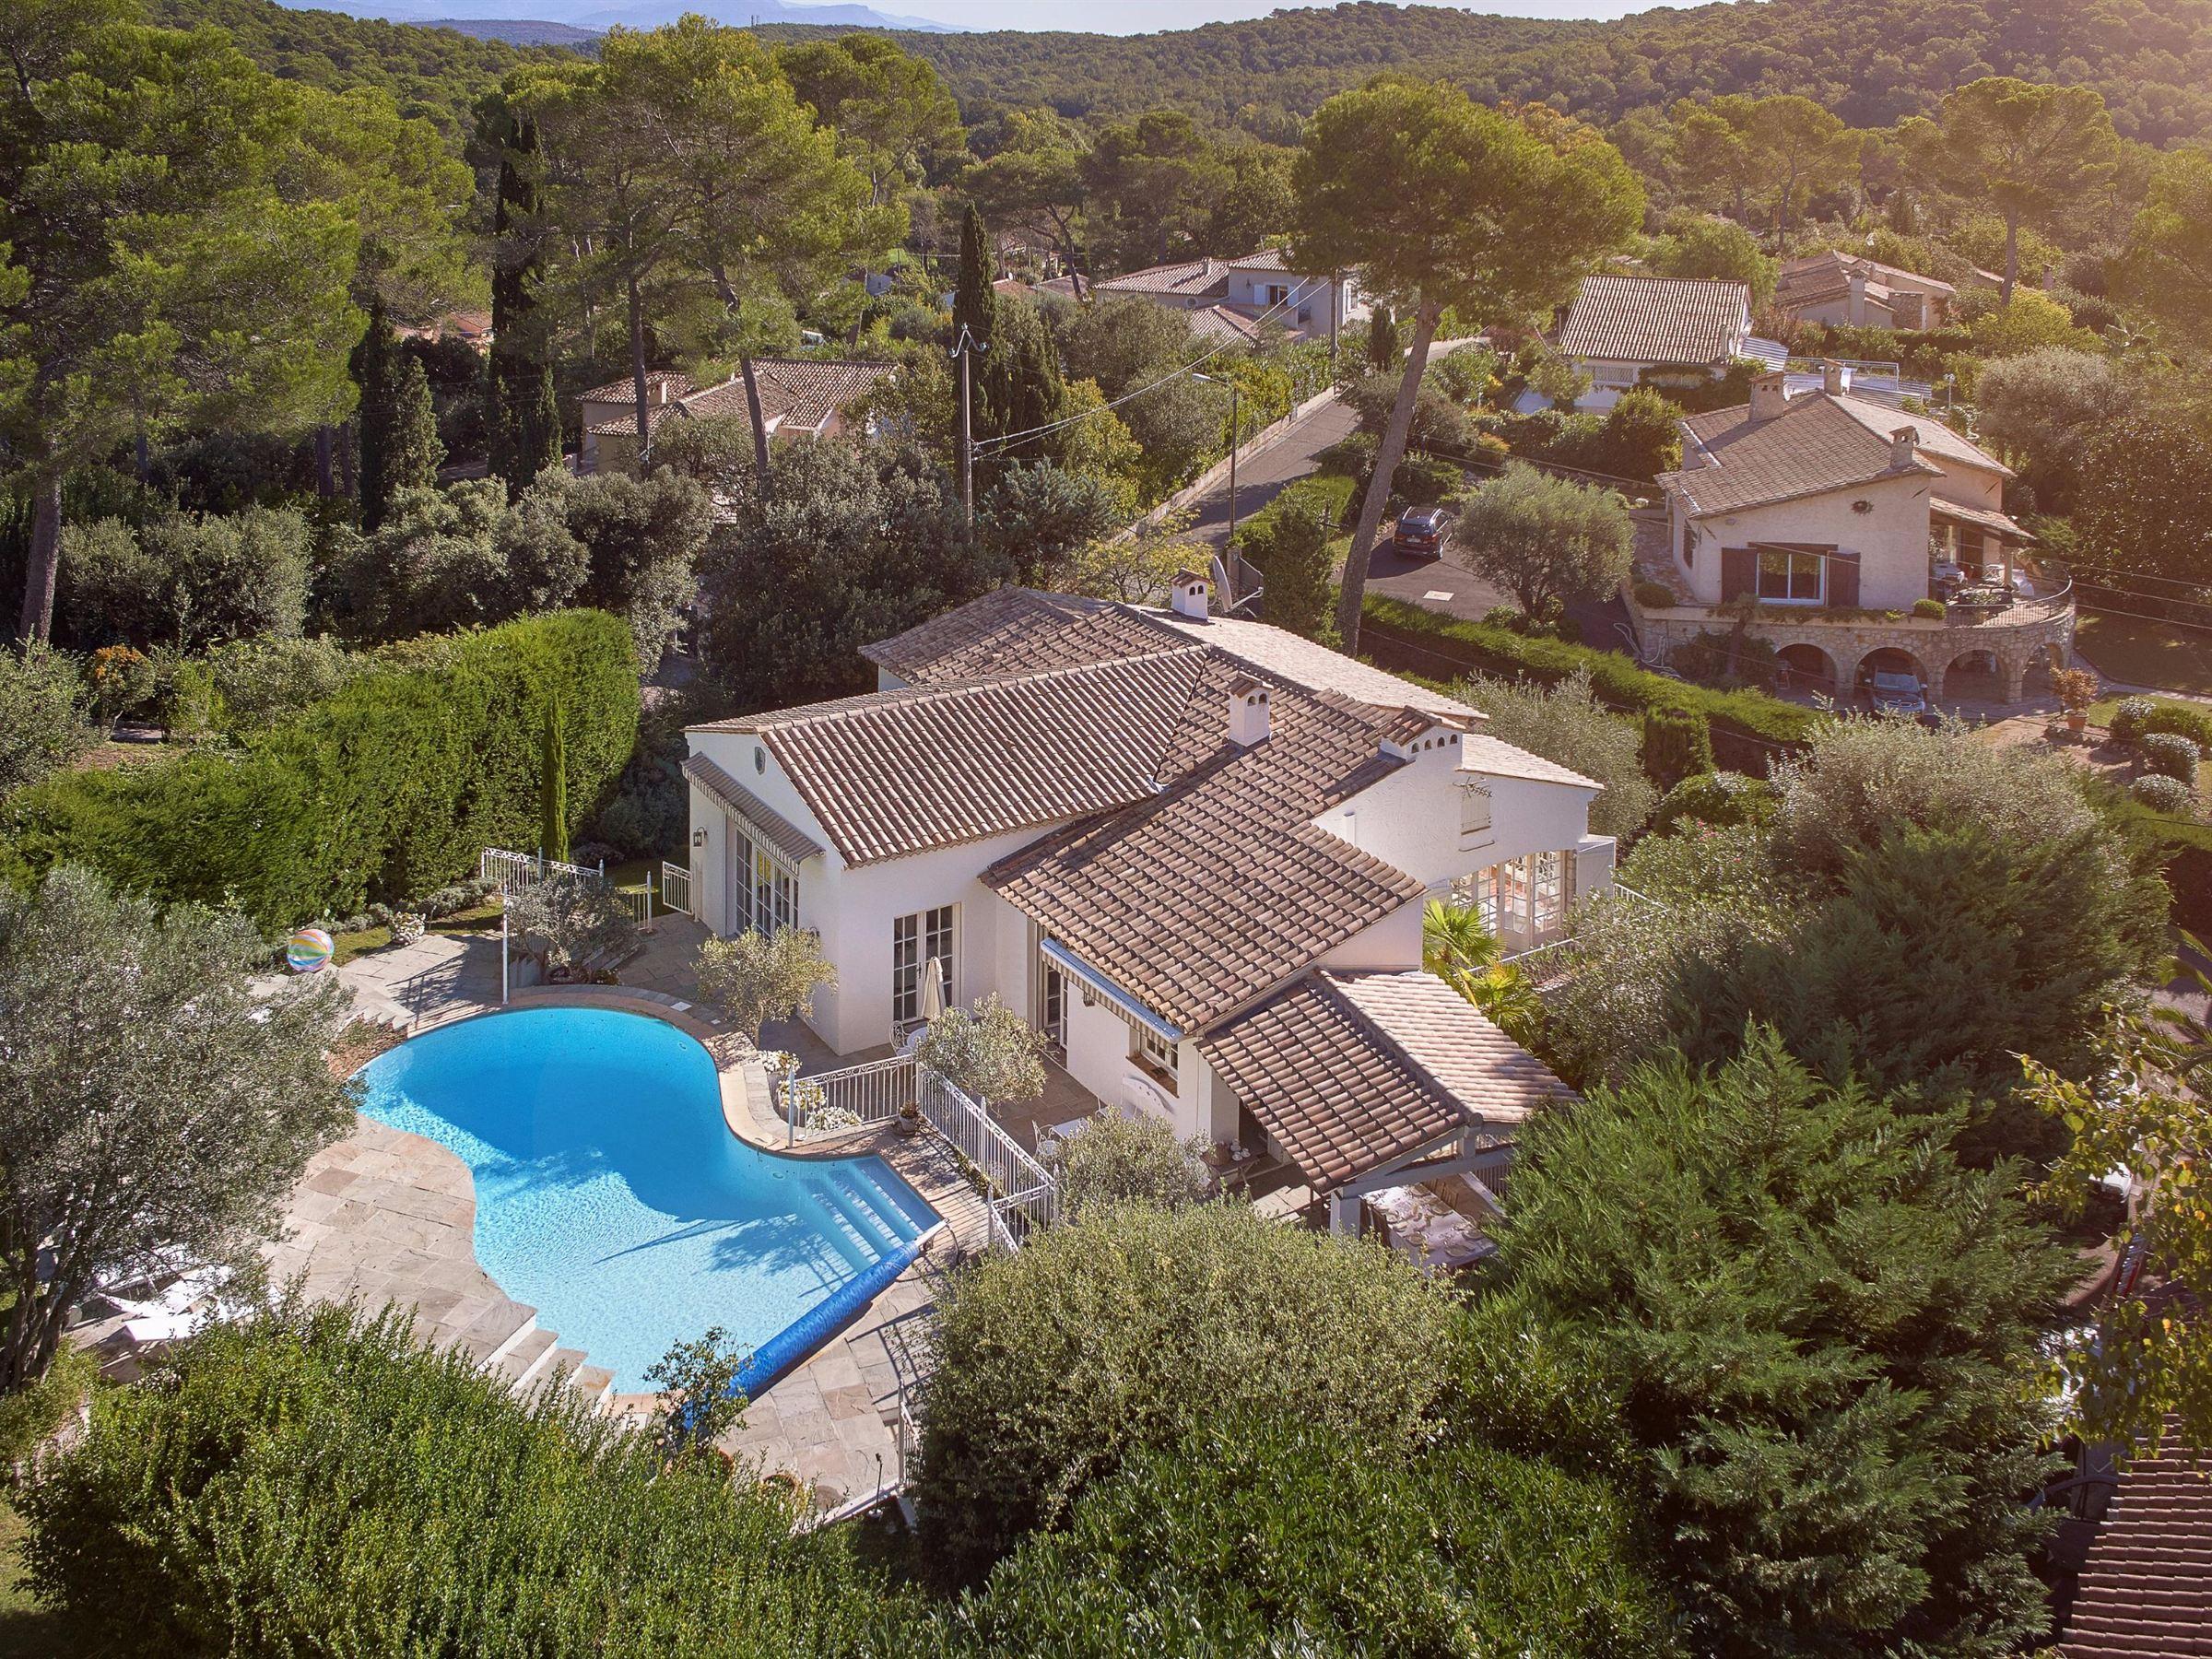 Villa per Vendita alle ore beautiful provençal villa in a private domain Mougins, Provenza-Alpi-Costa Azzurra 06250 Francia